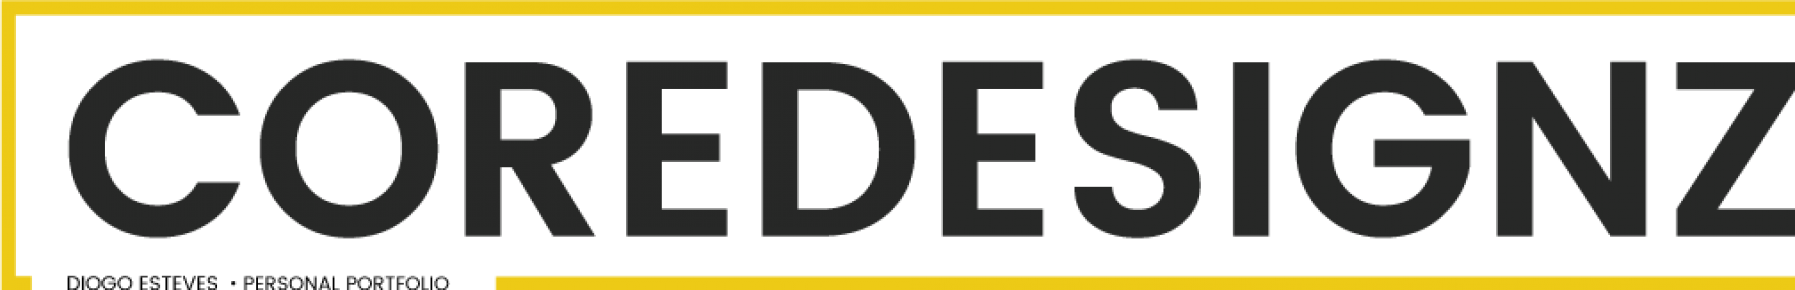 Blog CoreDesignz